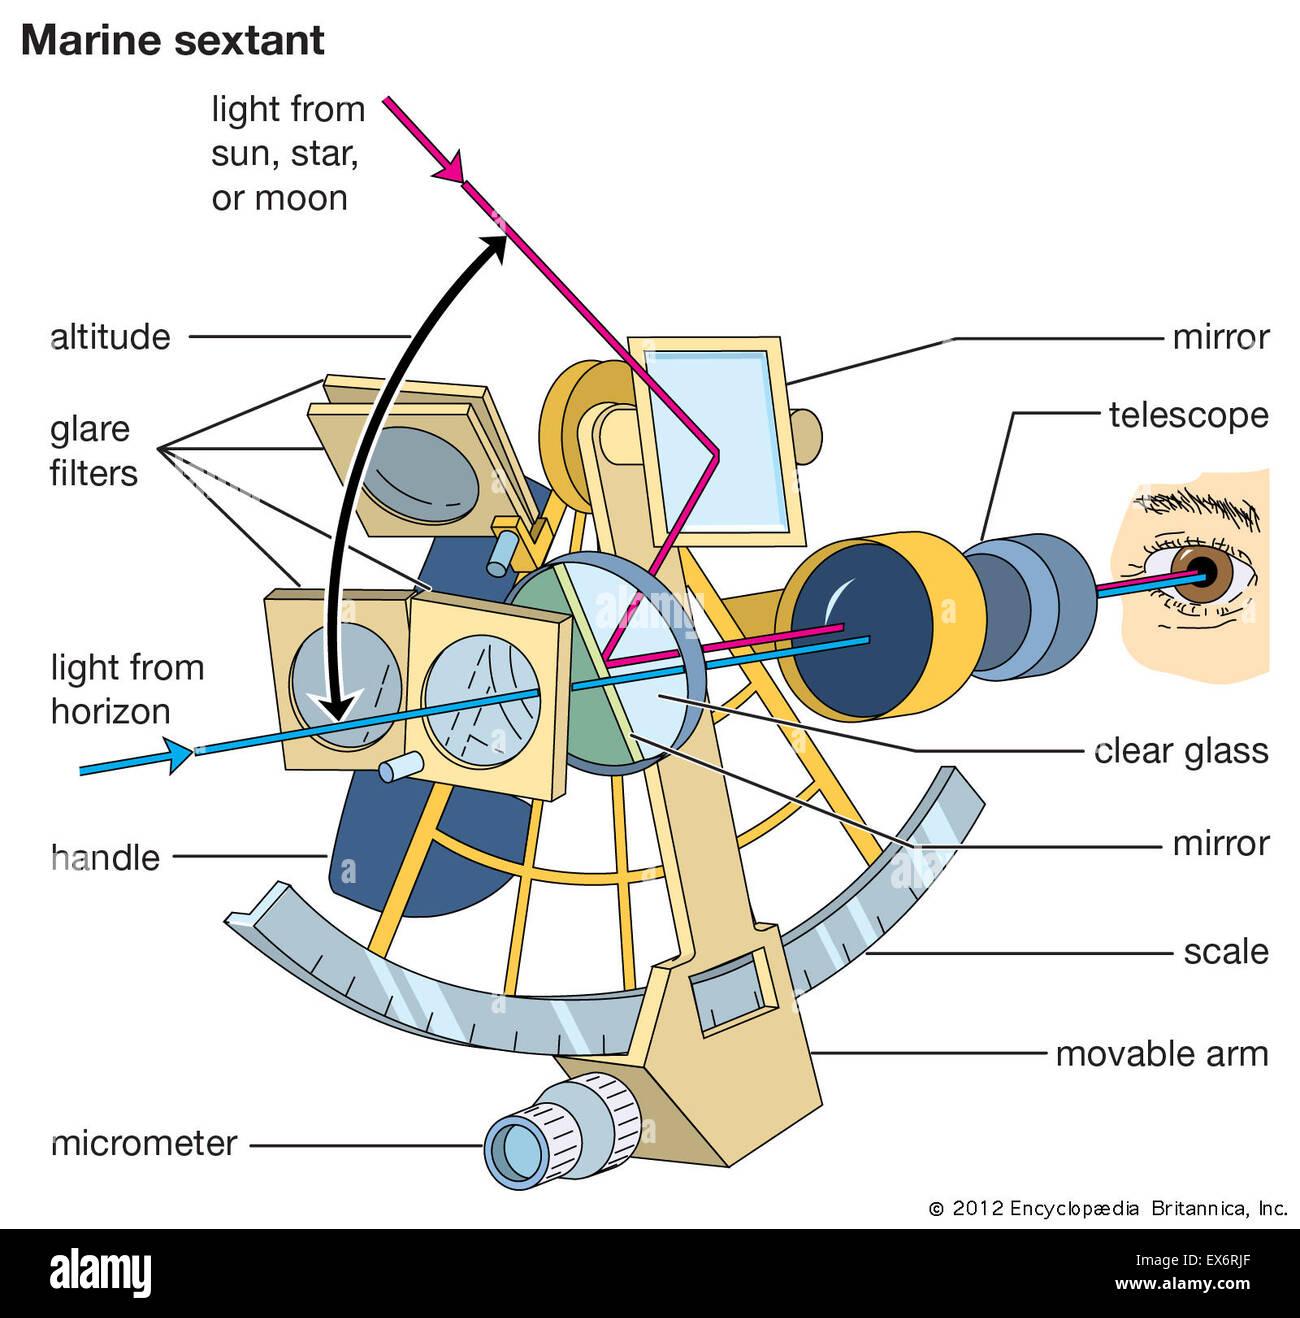 navigation: marine sextant stock photo - alamy  alamy